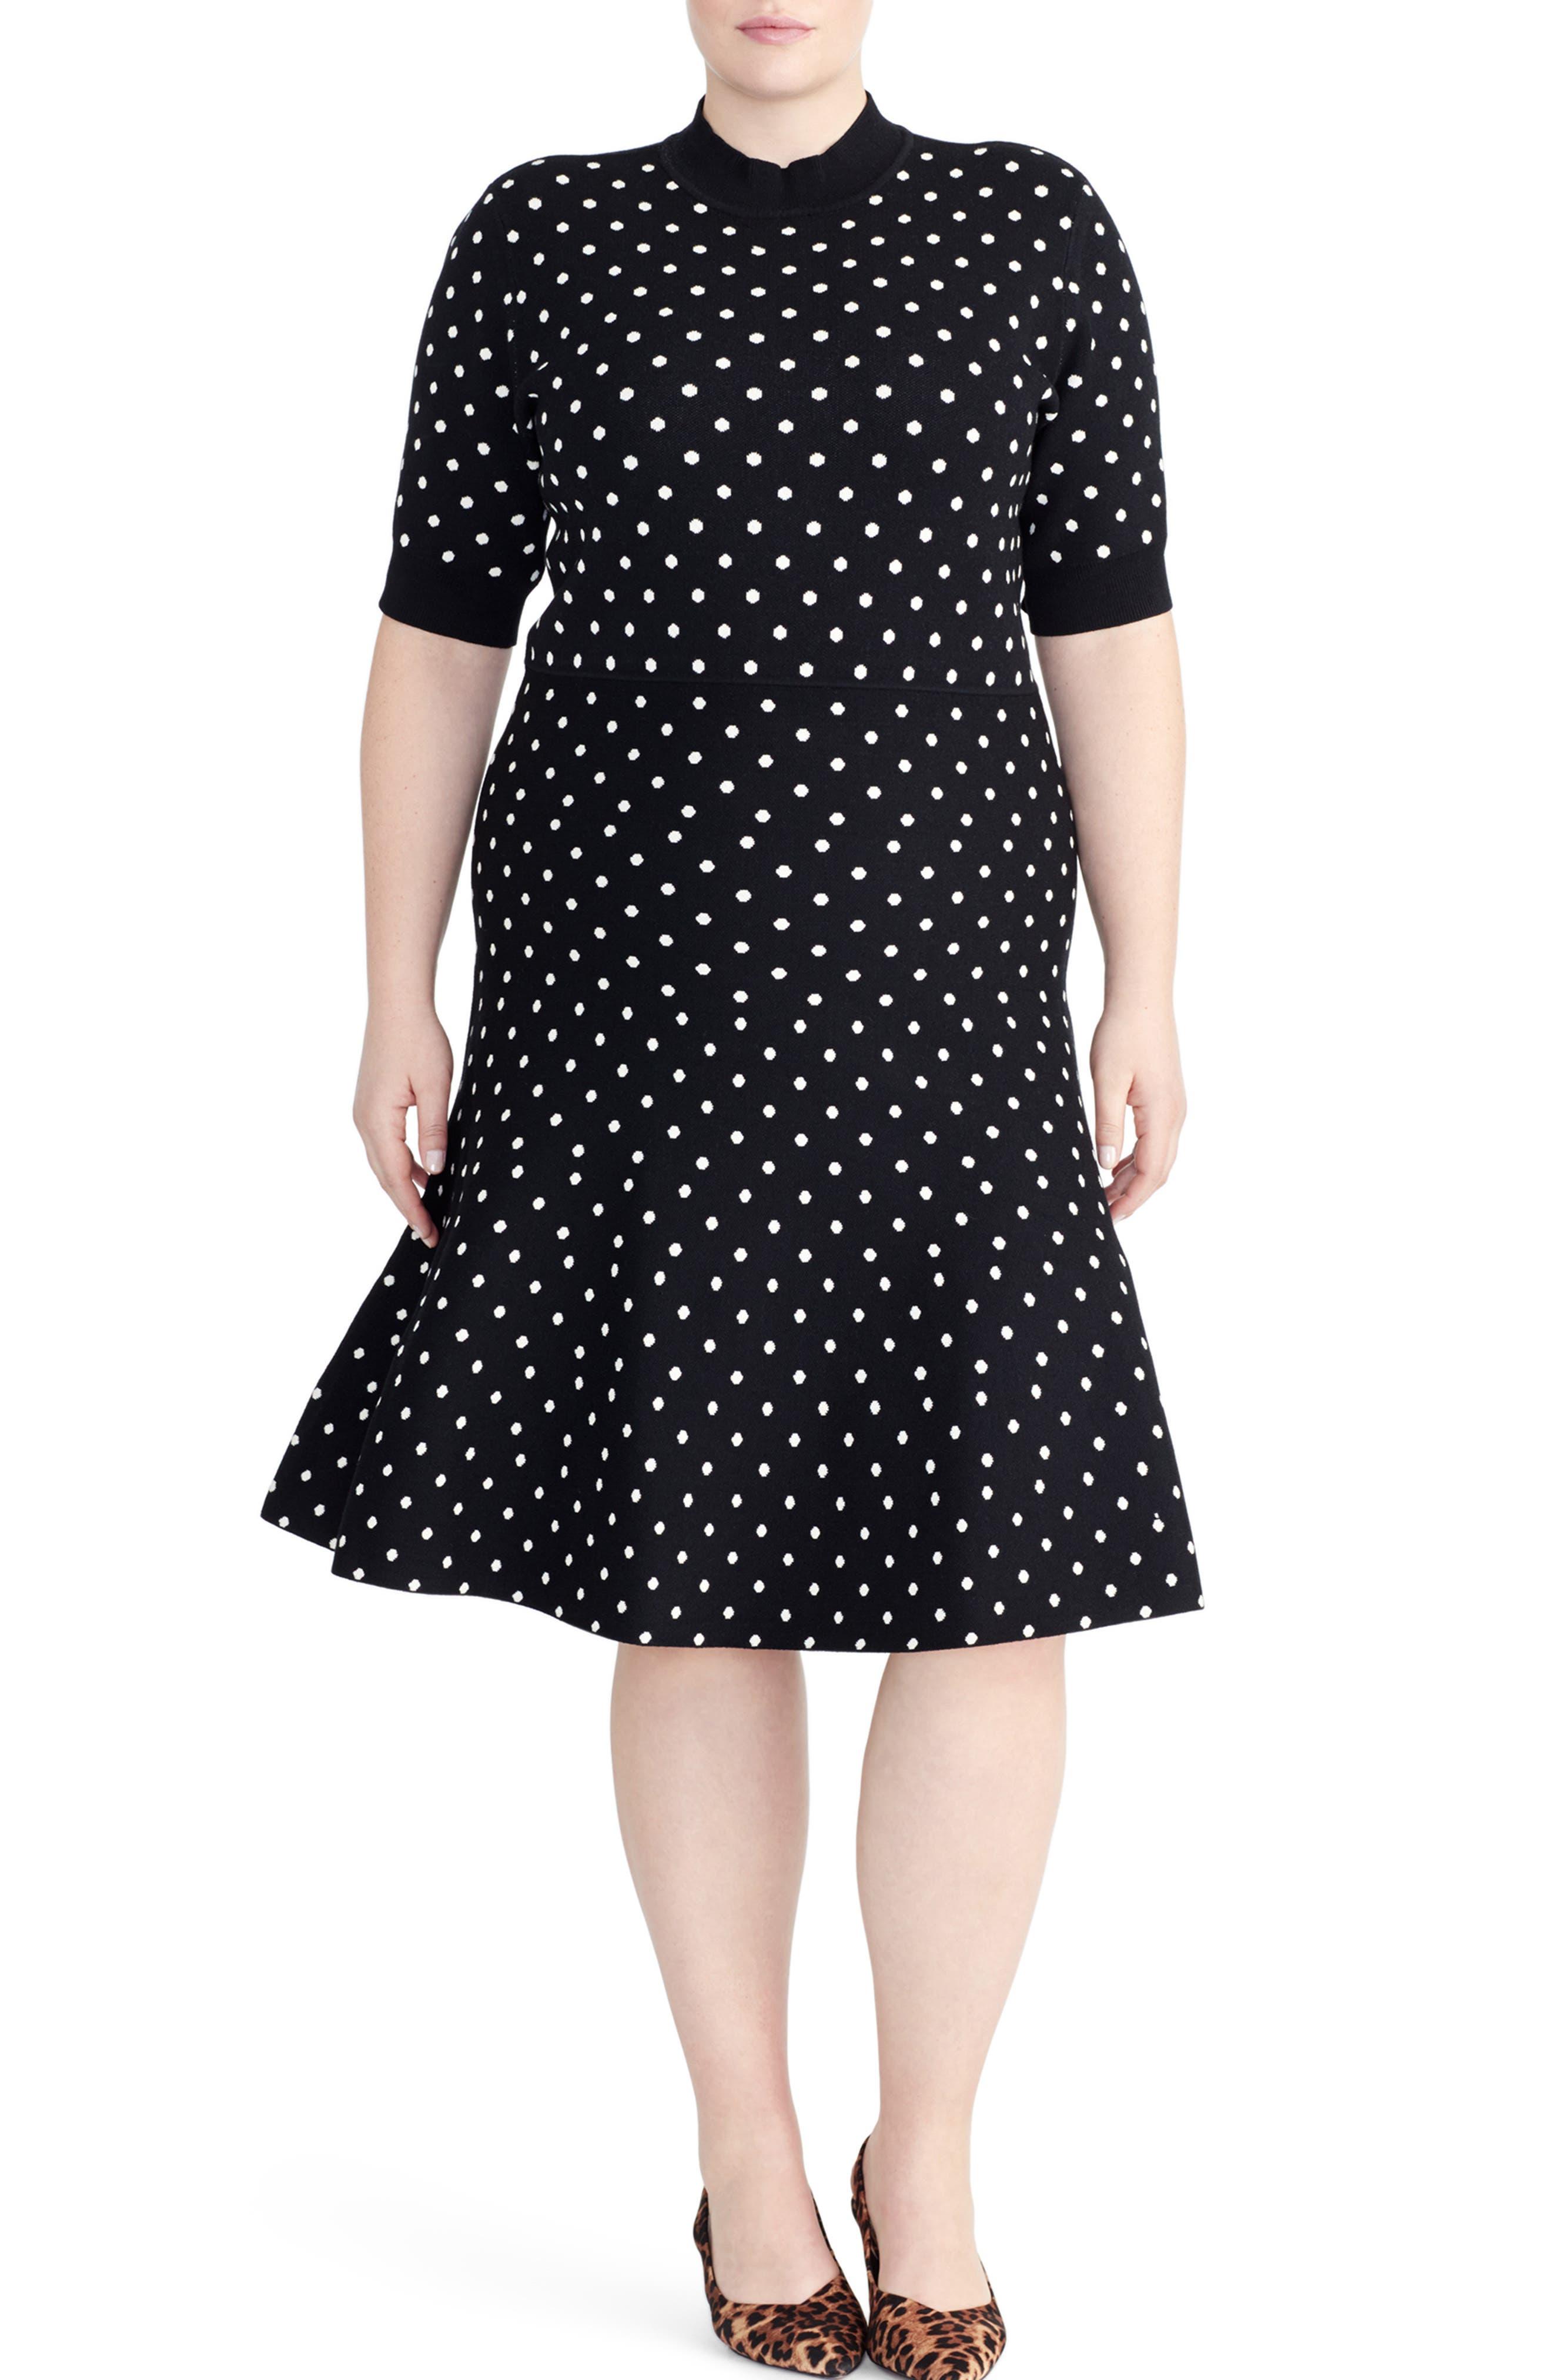 Plus Size Rachel Roy Collection Polka Dot Fit & Flare Dress, Black